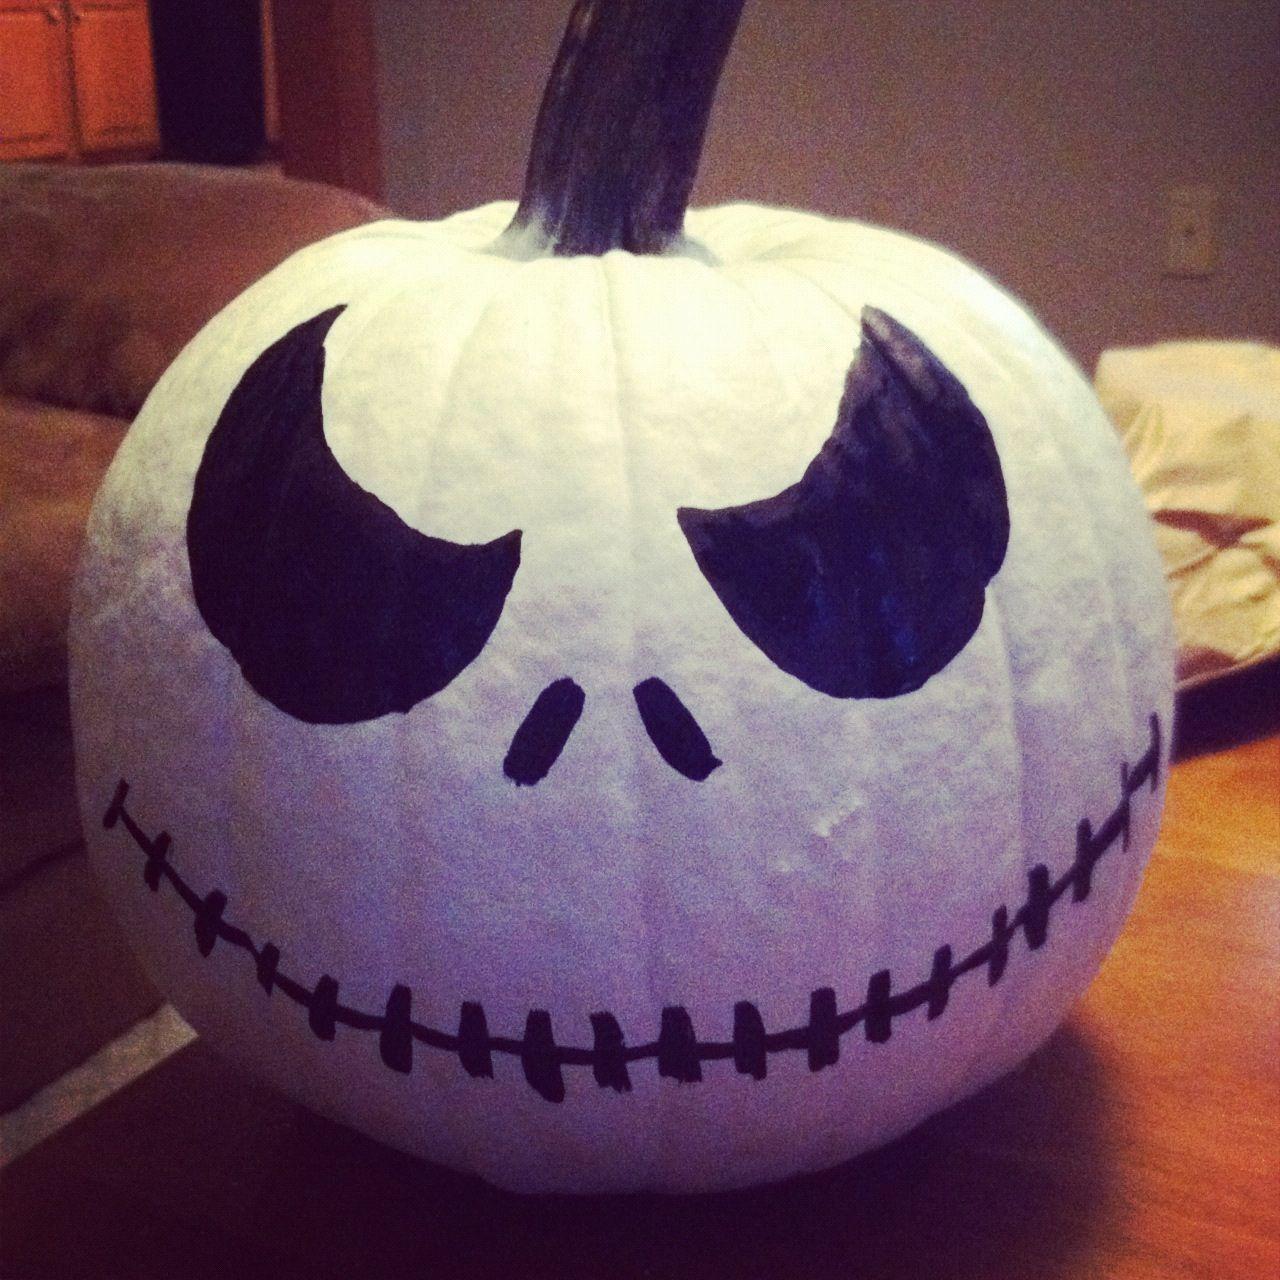 Jack skellington pumpkin. Spray paint a pumpkin white and